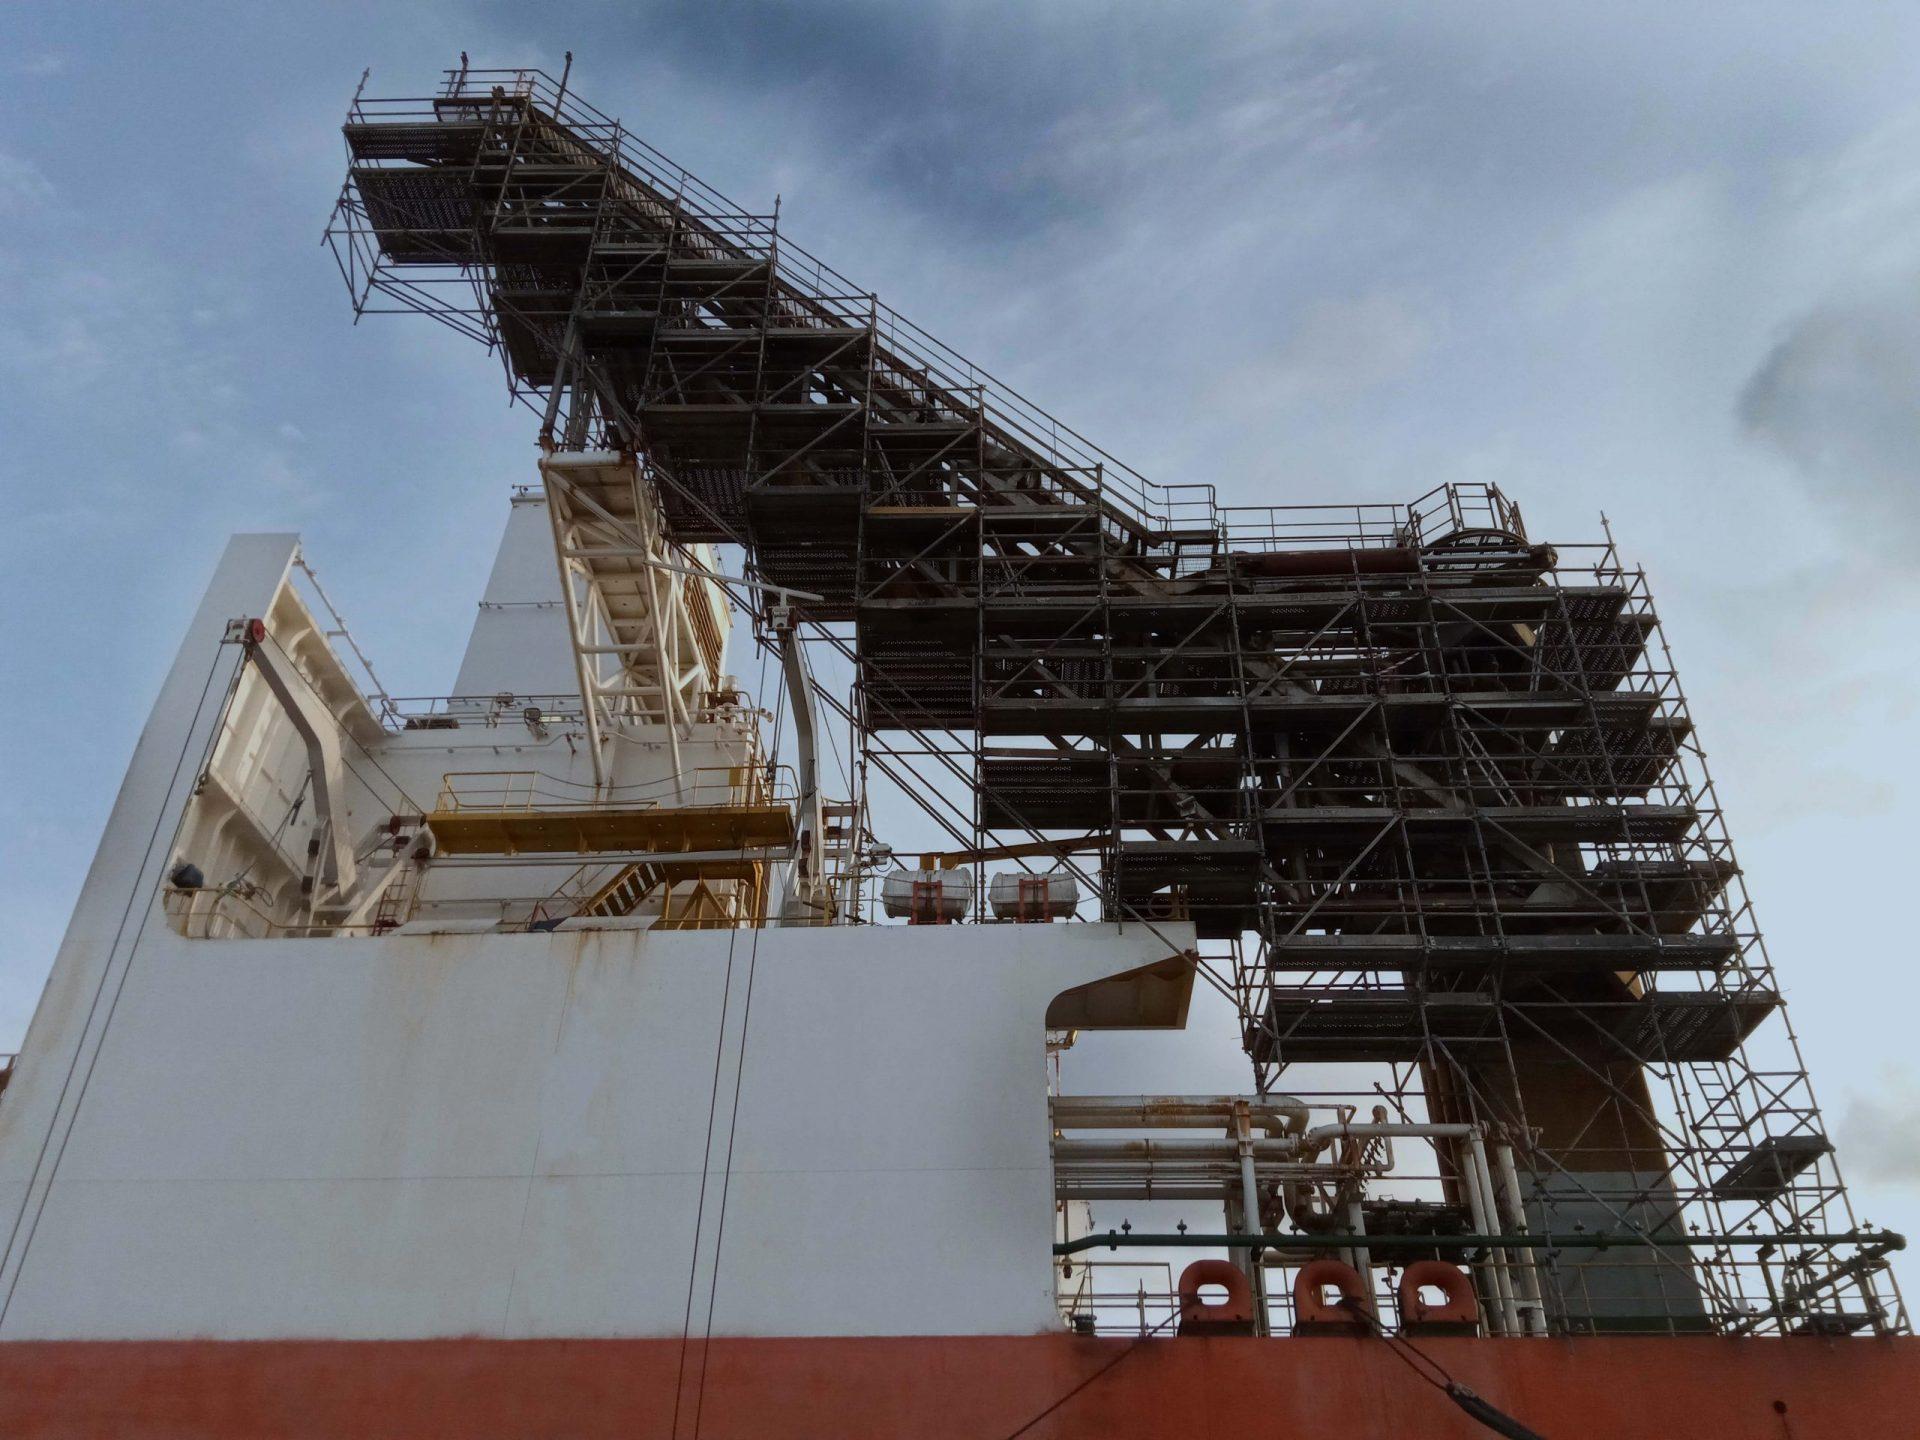 Flareboom scaffolding scaled